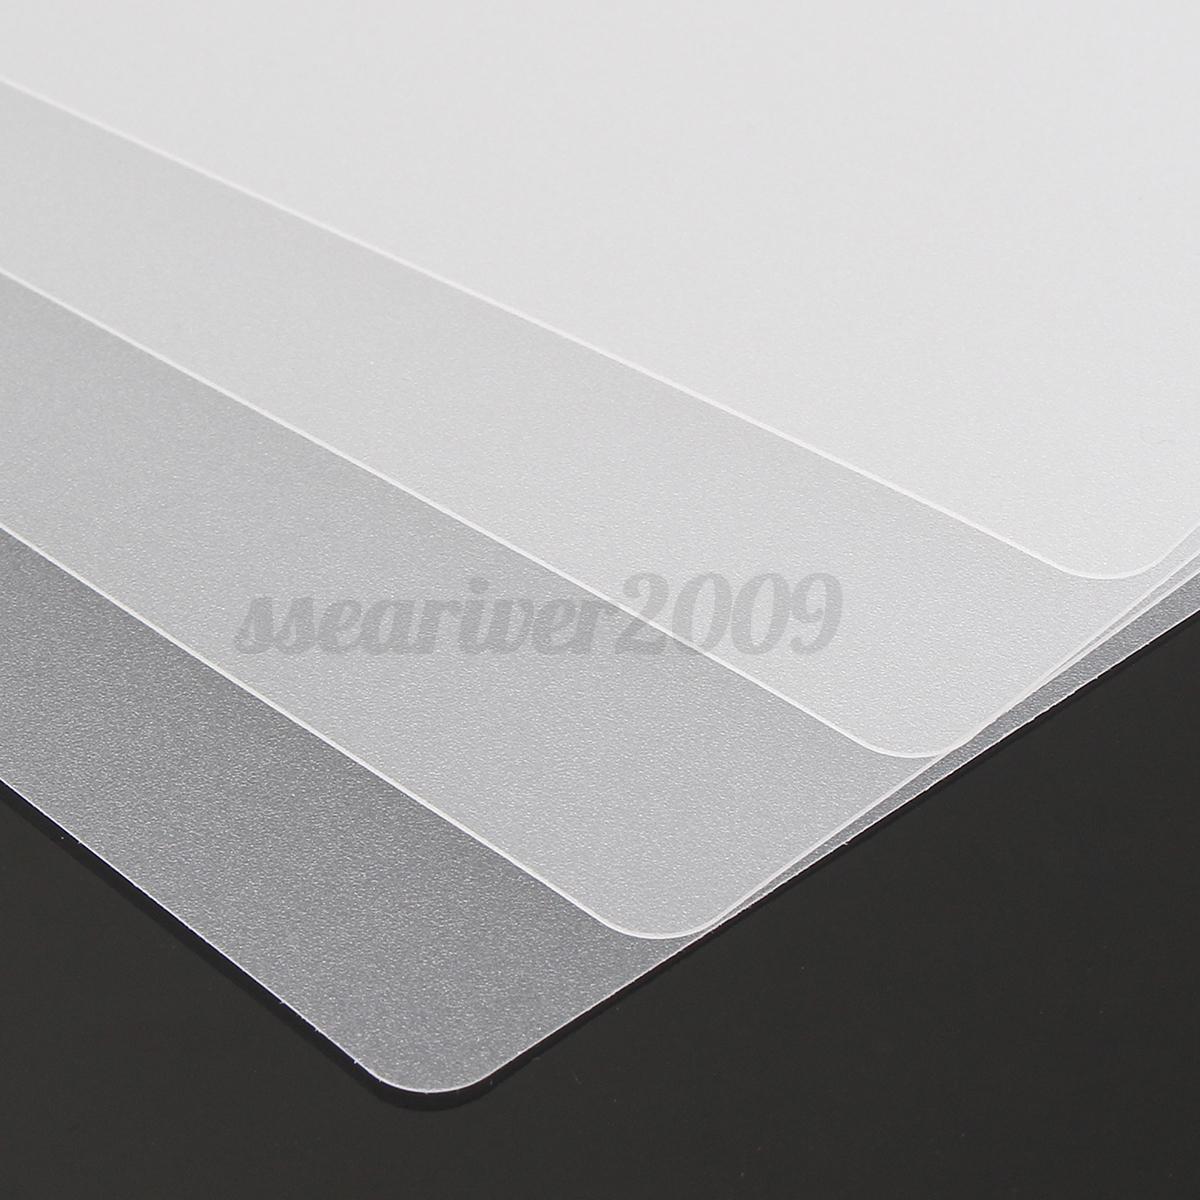 Set of 4 Plastic Clear Placemat Kitchen Tableware Place  : BD828C375616279667249A8D23CFCF93D6C96E9A9363CA732316D2F403168366D243C6CDE053D28399CB9BD2CCBB43CE564693C663565E9A63CDF553 from www.ebay.com size 1200 x 1200 jpeg 823kB